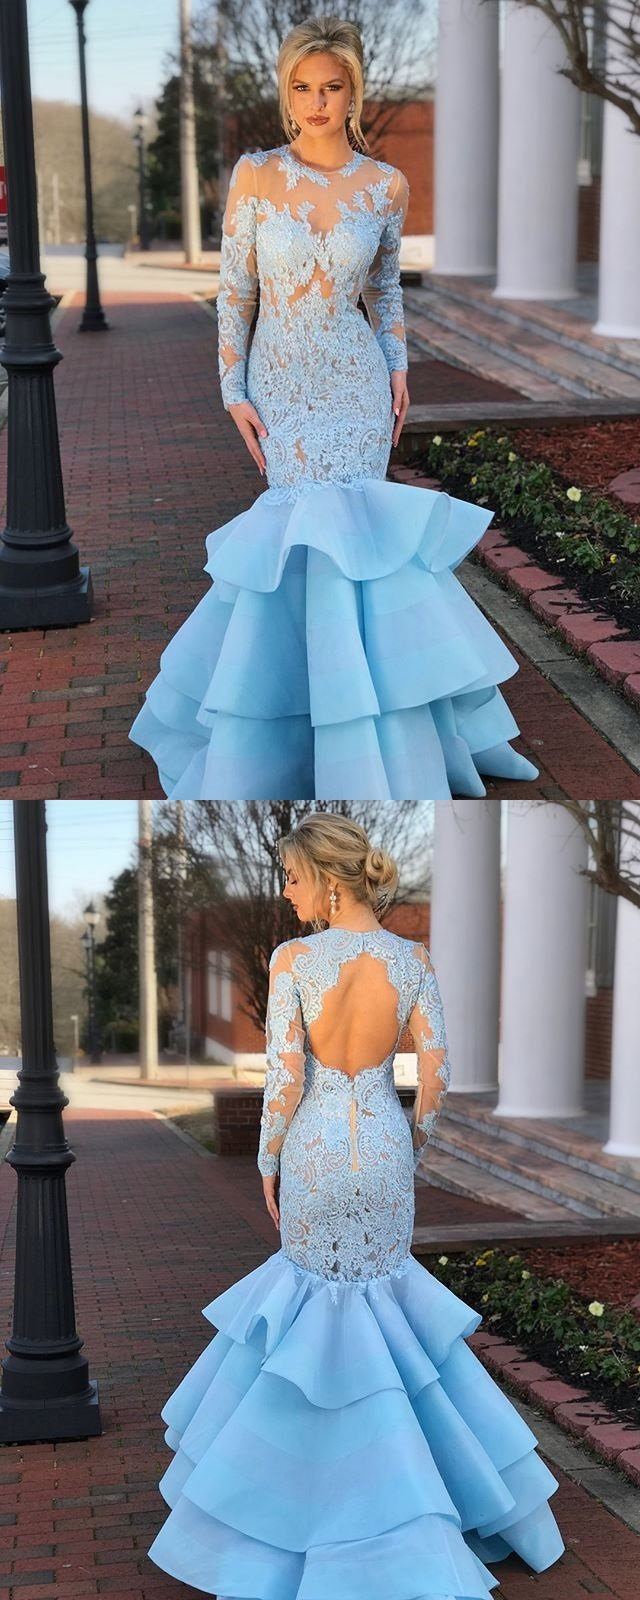 Blue lace long sleeve prom dress memraid openback tulle prom dress